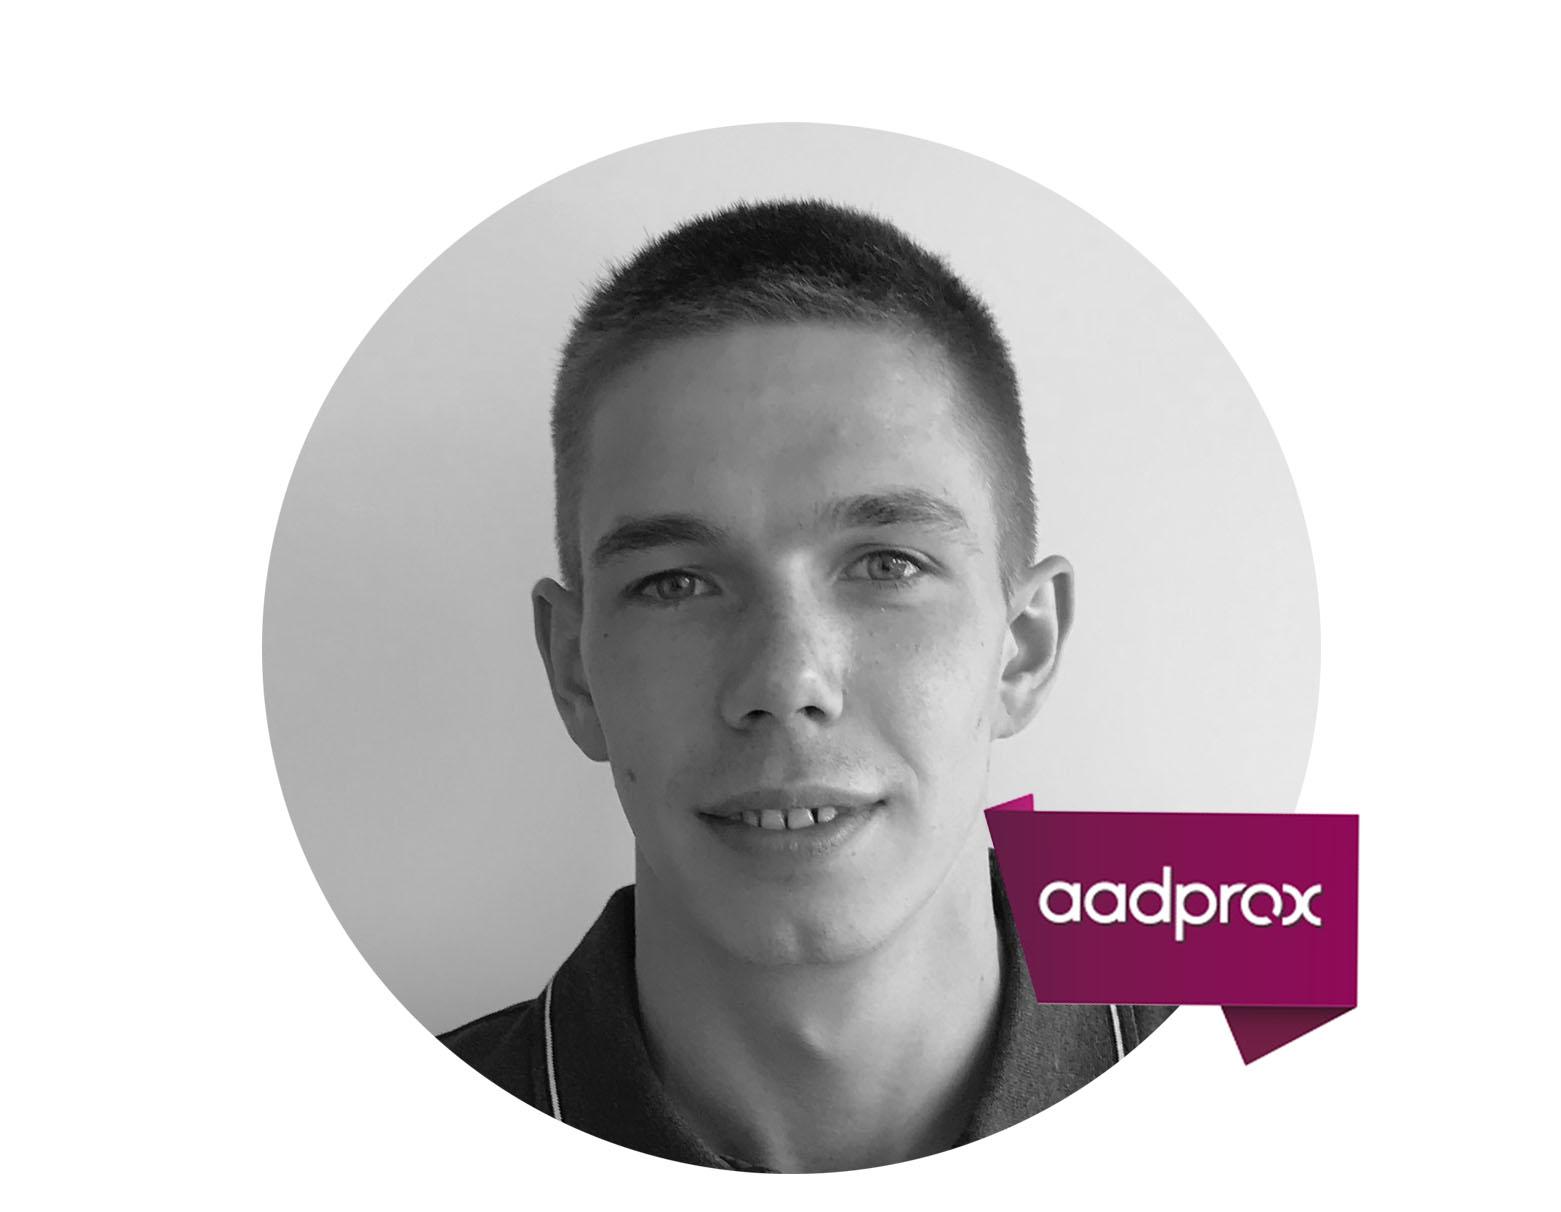 Devenir Aadprox : Focus sur Morgan Lemoine